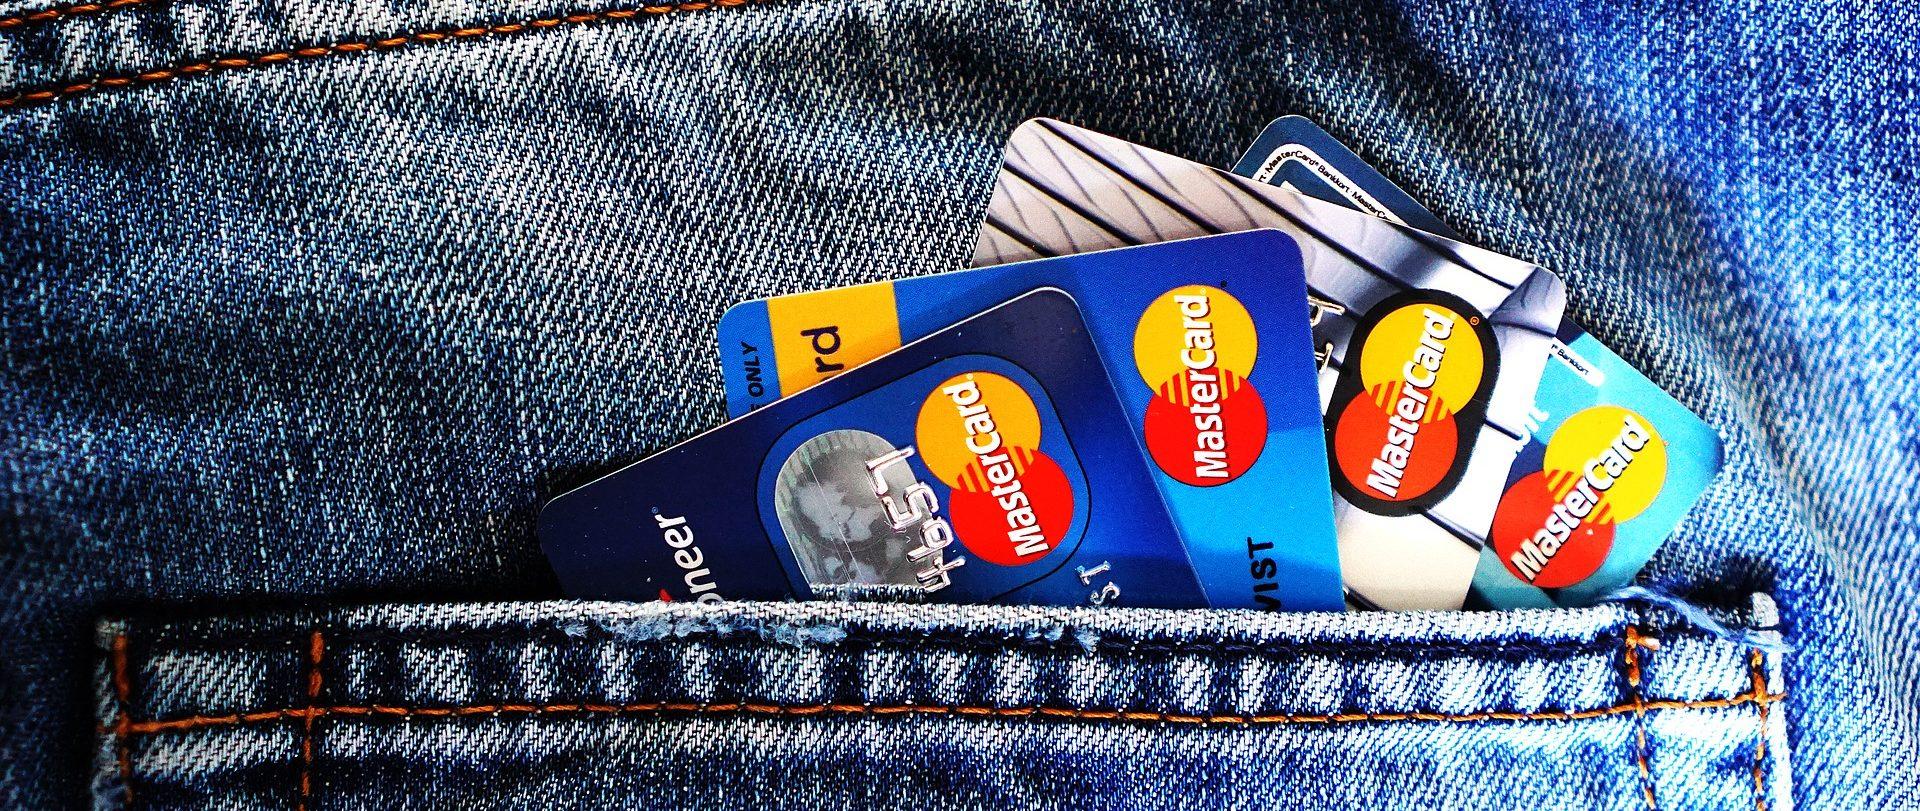 credit-card-1583534_1920-e1538293640711